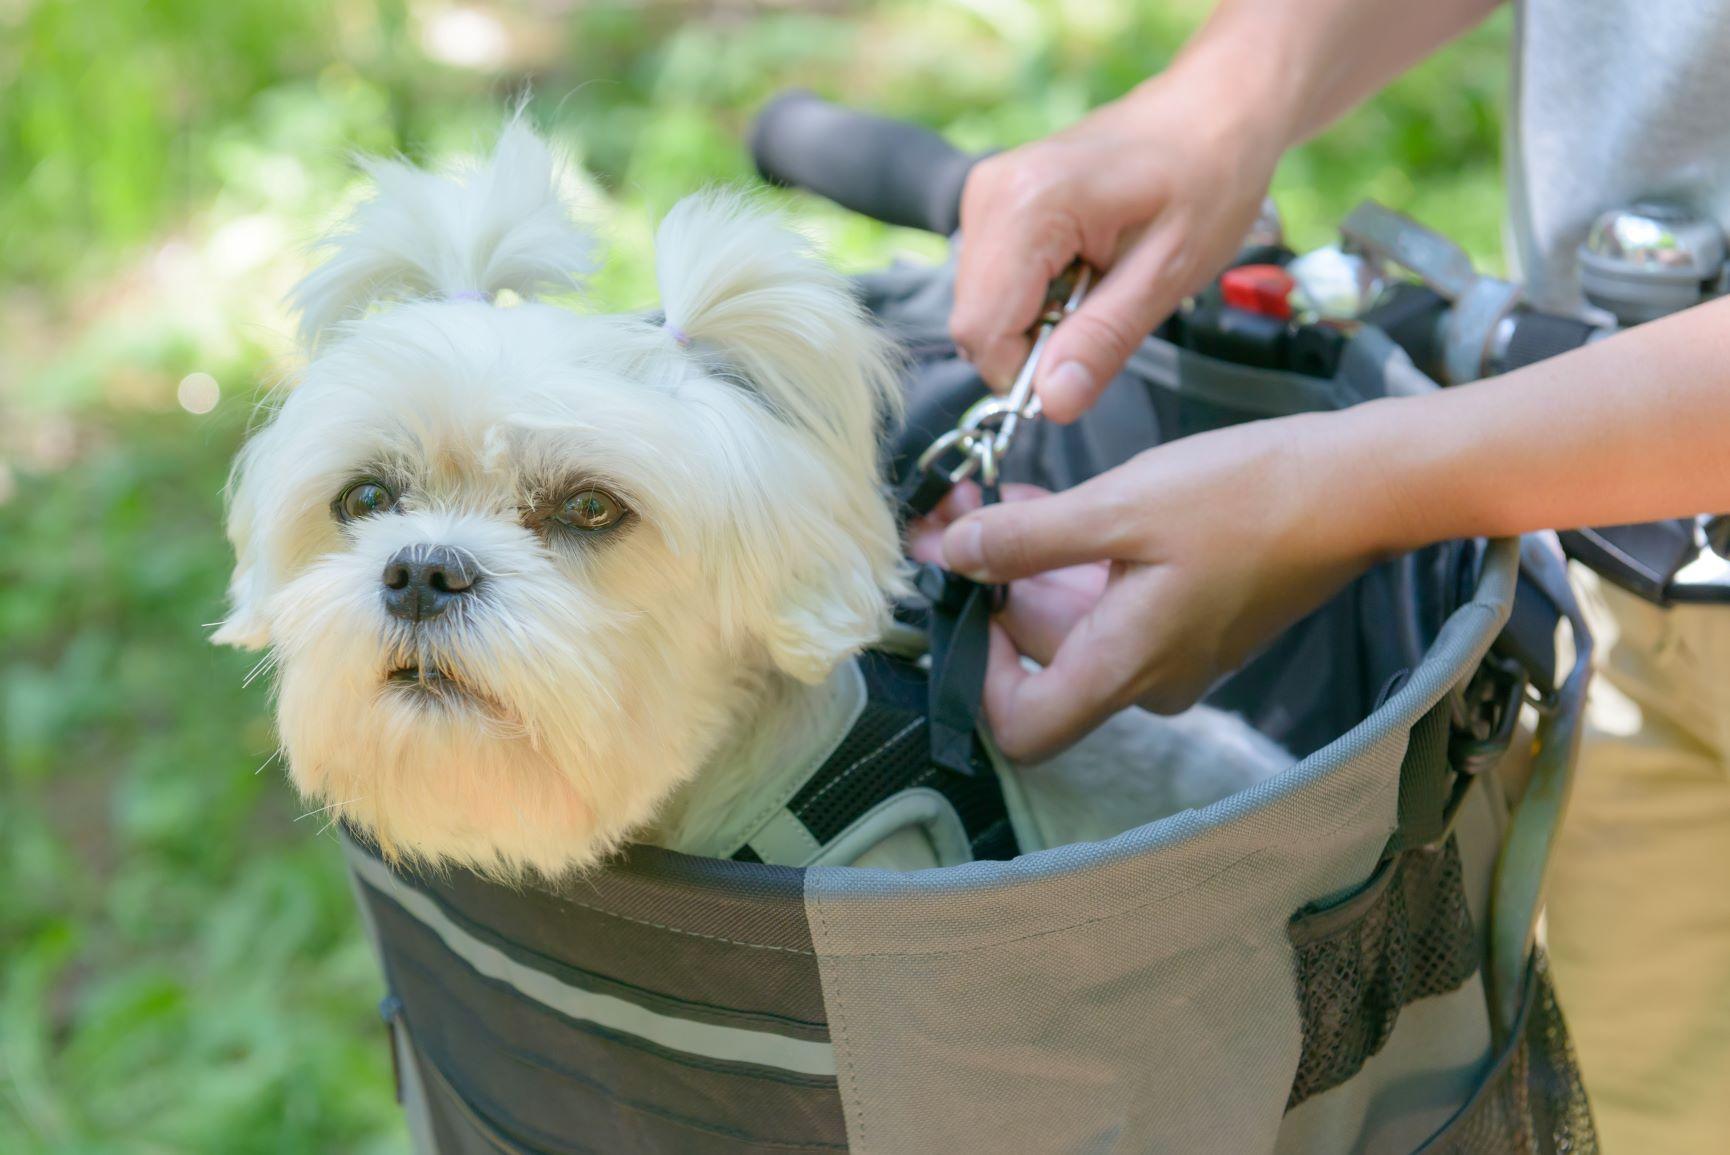 Hund im Hundekorb am Fahrrad